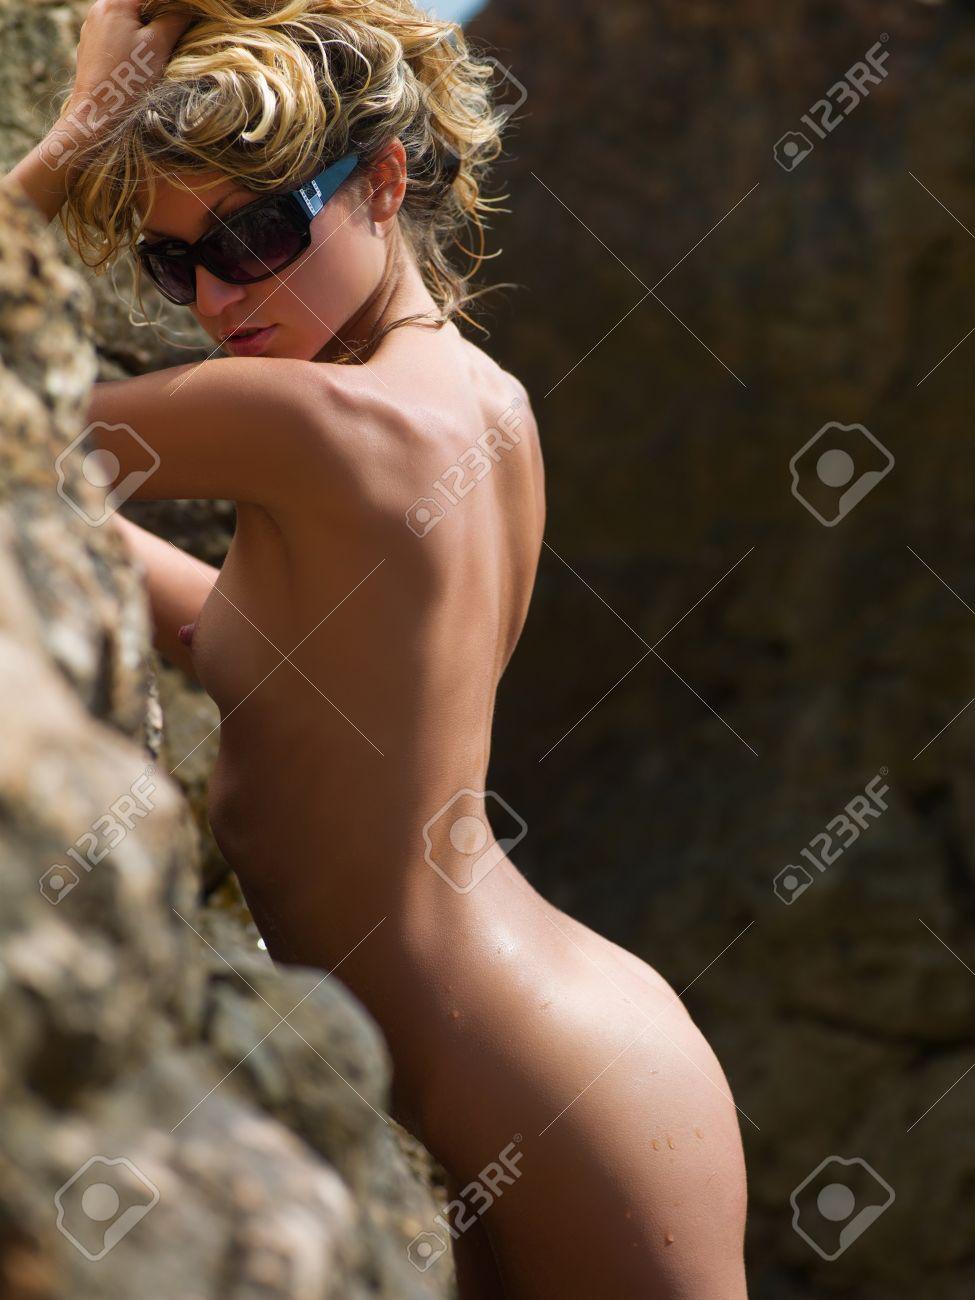 beautiful nude woman standing near a rock on the beach Stock Photo - 9143847